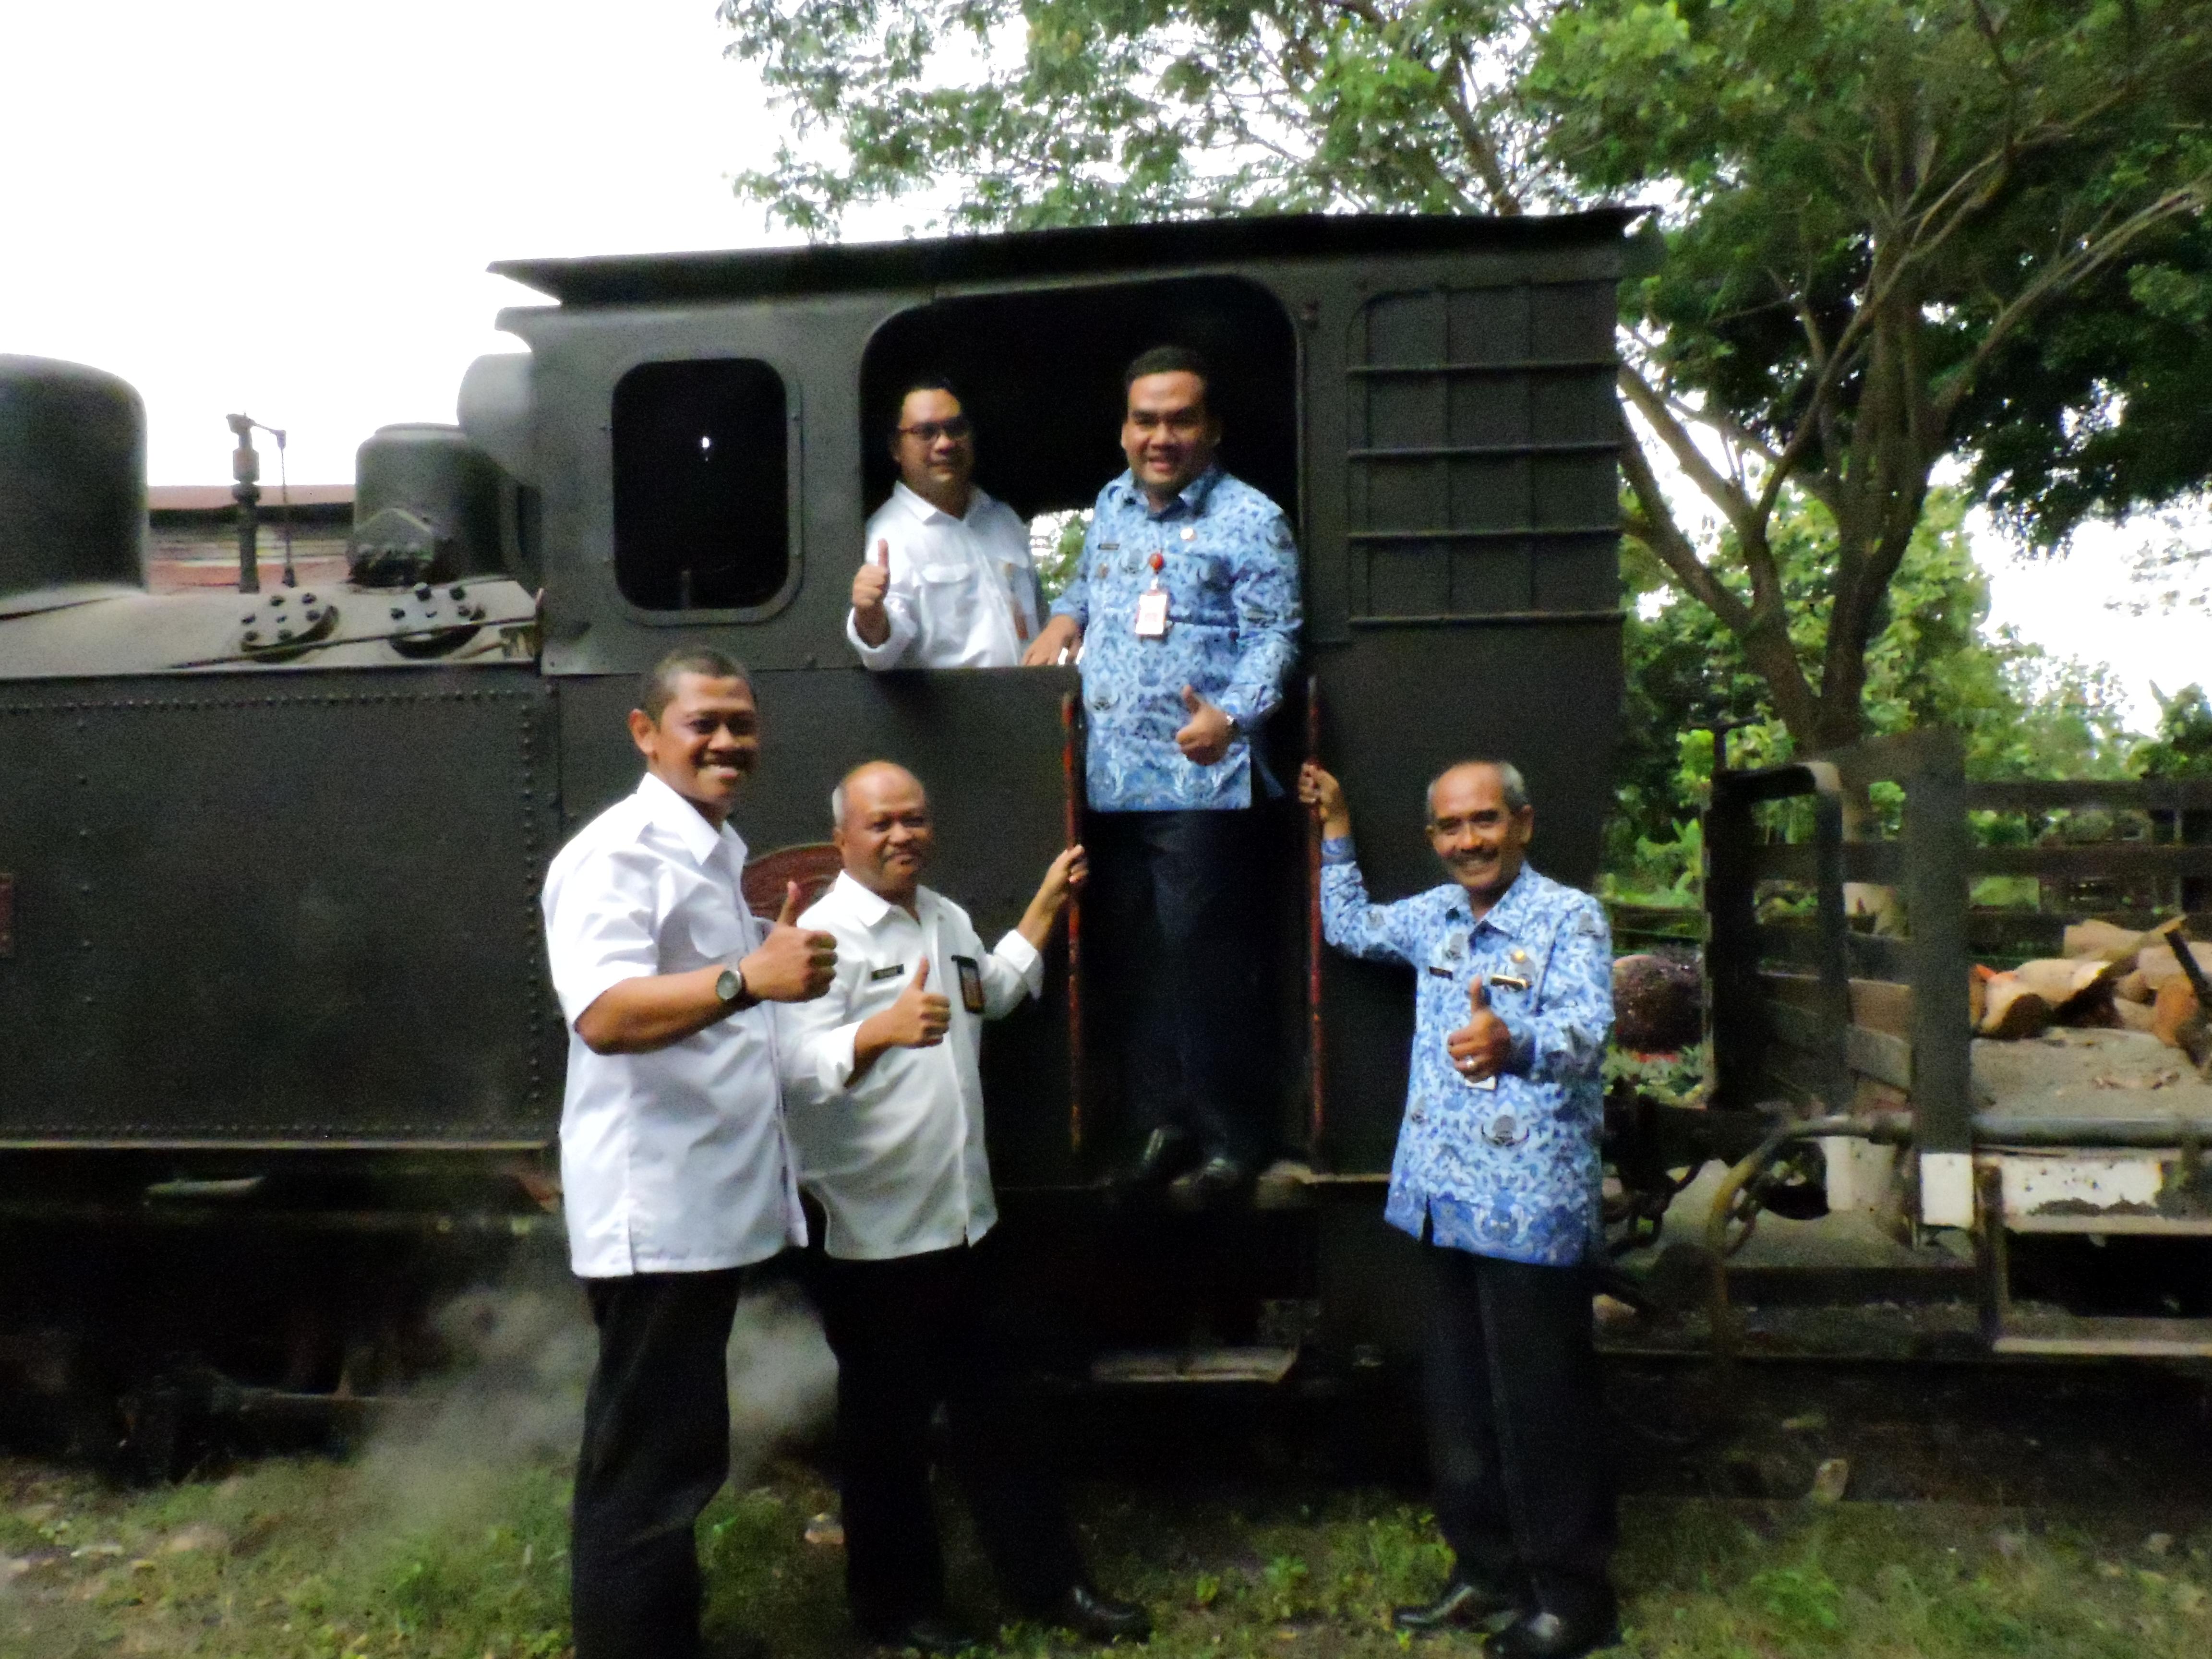 Heritage Loco Tour Perhutani Kph Cepu Kabar Daun Jati Blora